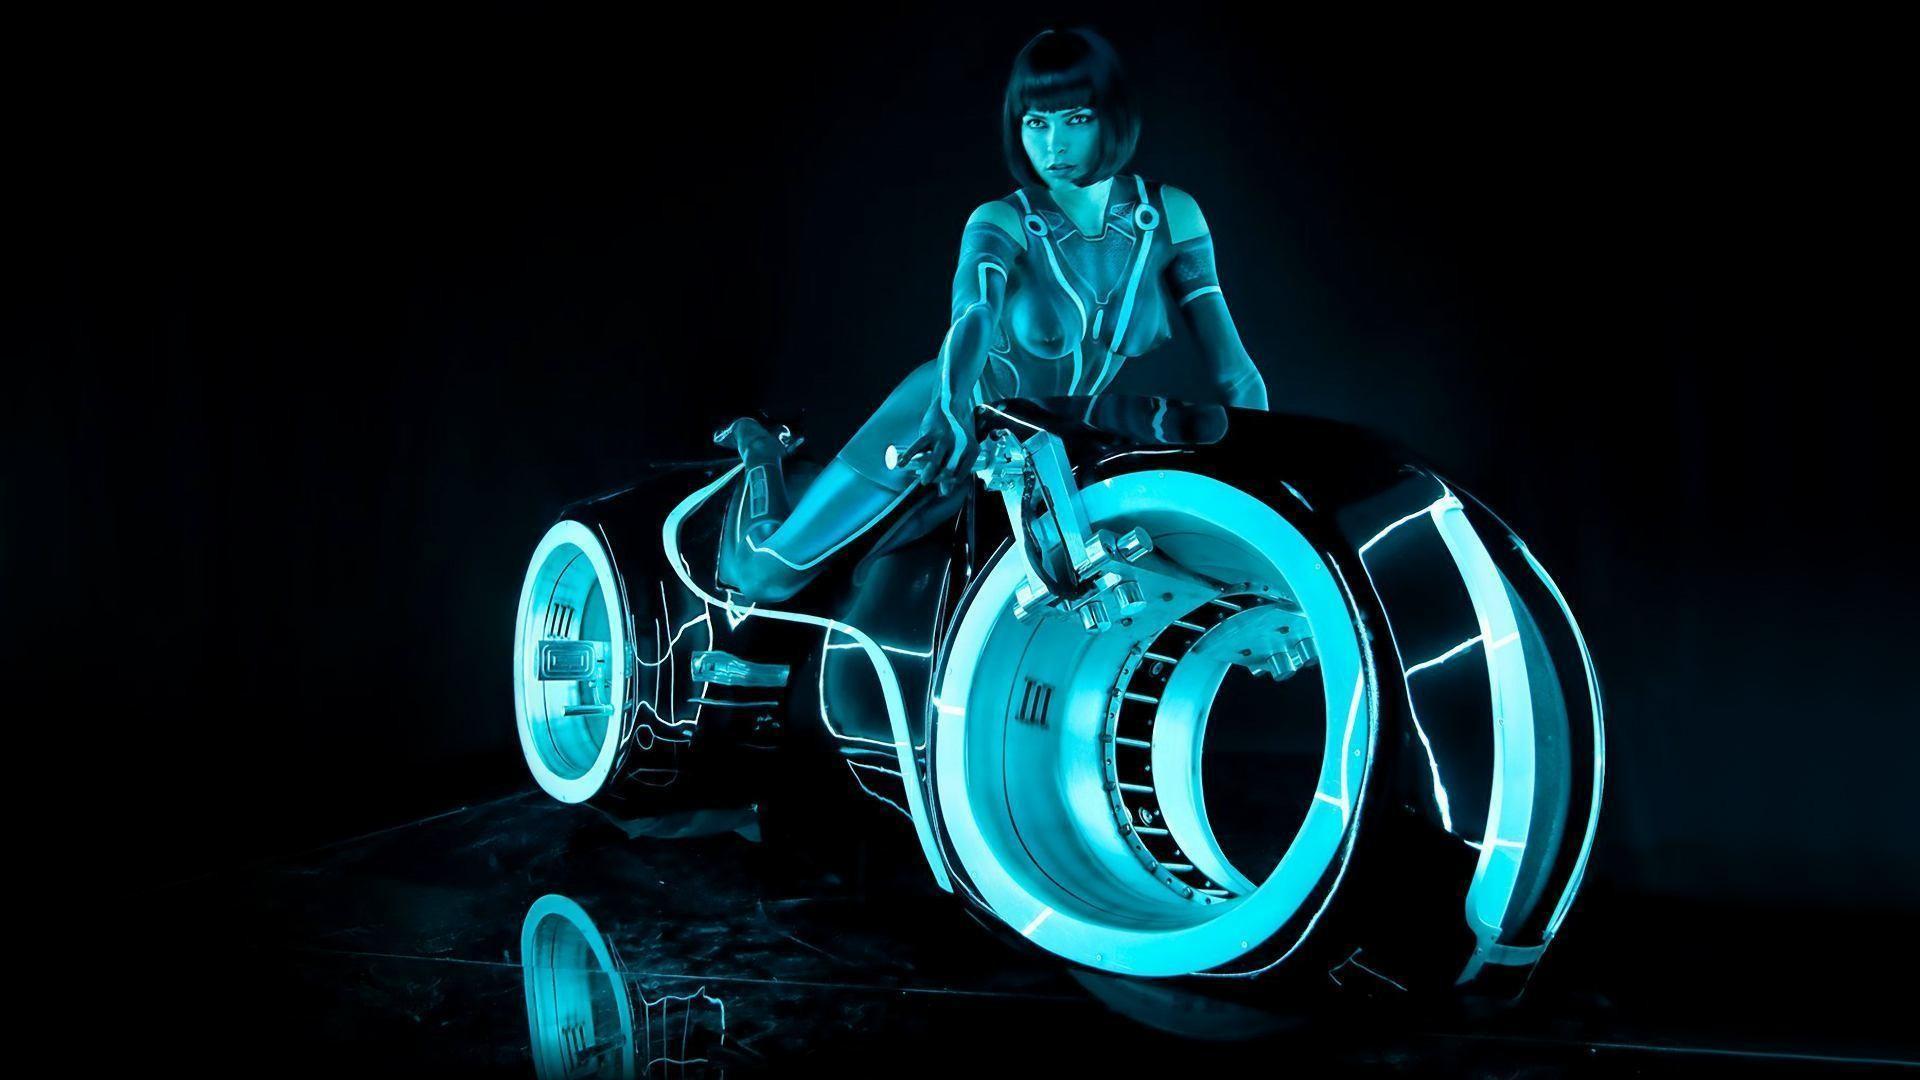 Tron неон мотоциклы  № 3312161 бесплатно